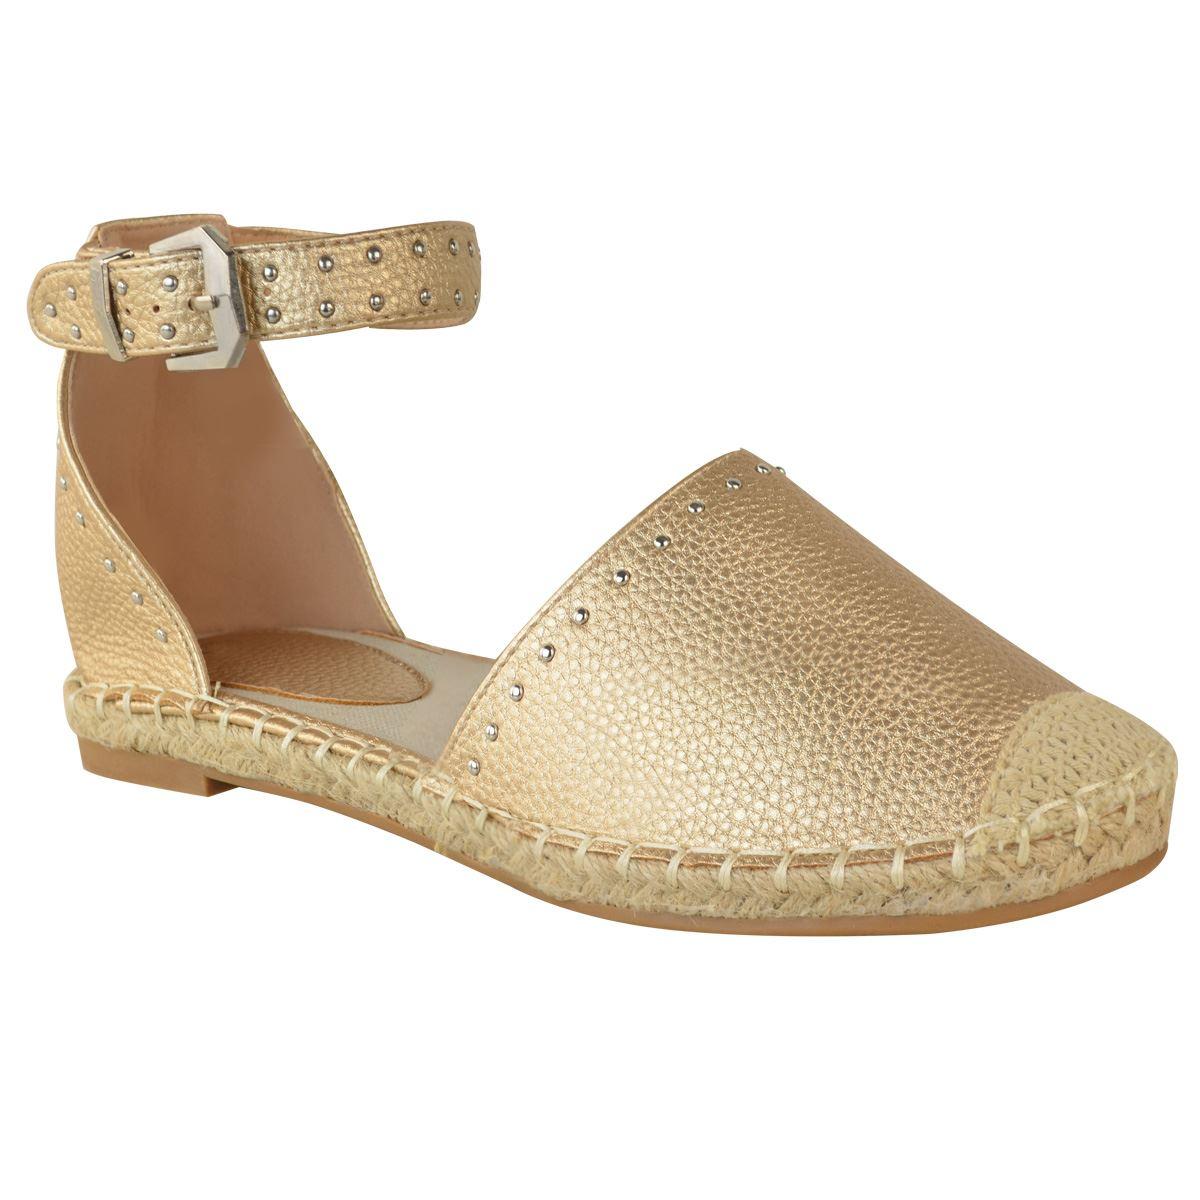 Womens-Ladies-Flat-Summer-Sandals-Summer-Flatforms-Ankle-Strap-Stud-Shoe-Size